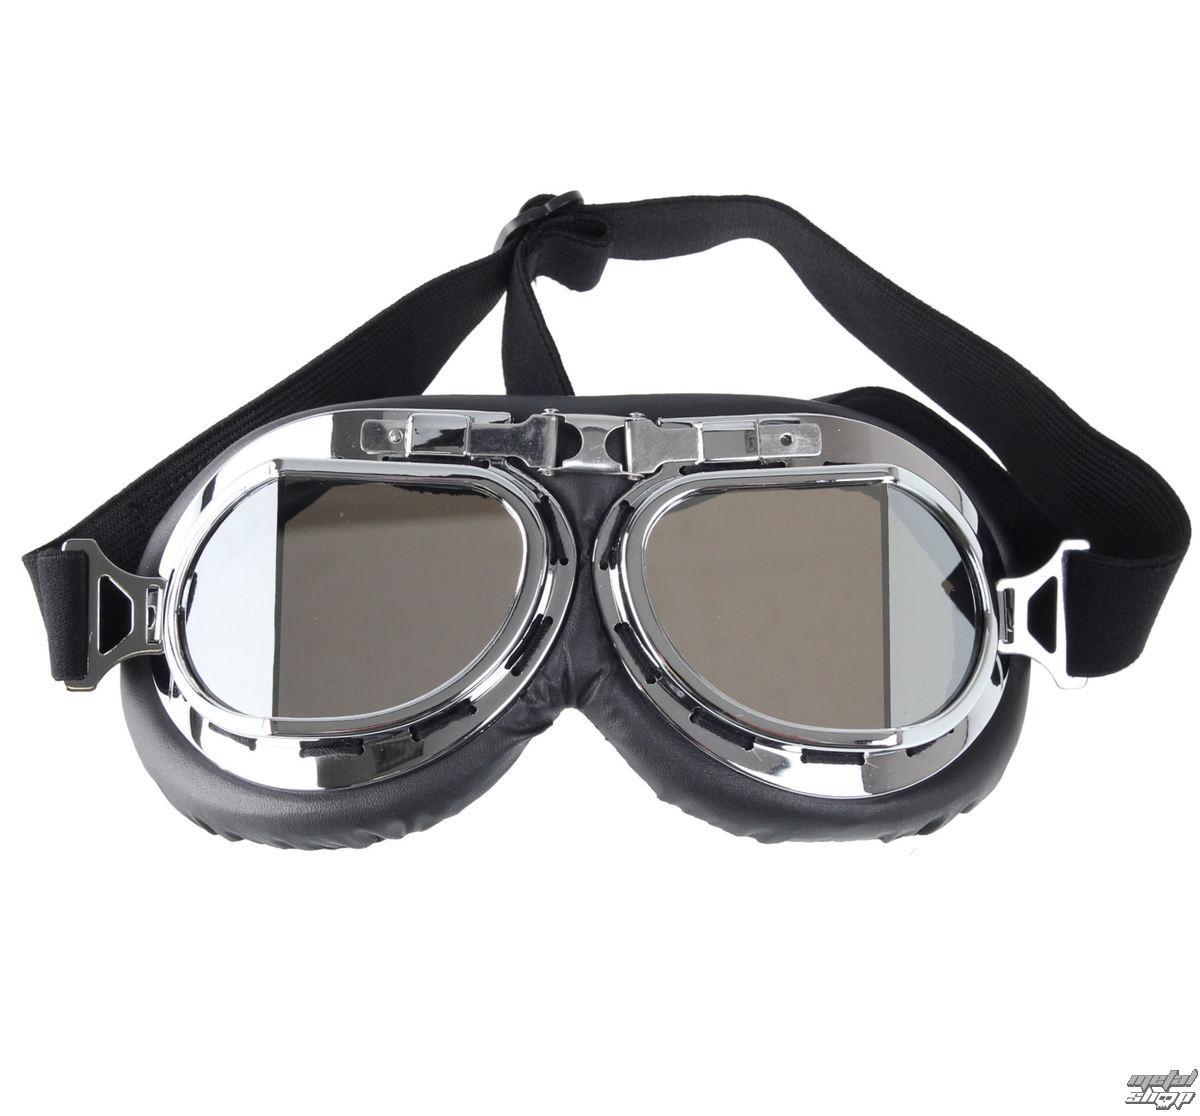 Cyber OSX szemüveg - GOGGLE - MIRROR LENS - US-03MR - Metalshop.hu 38df96b5a7